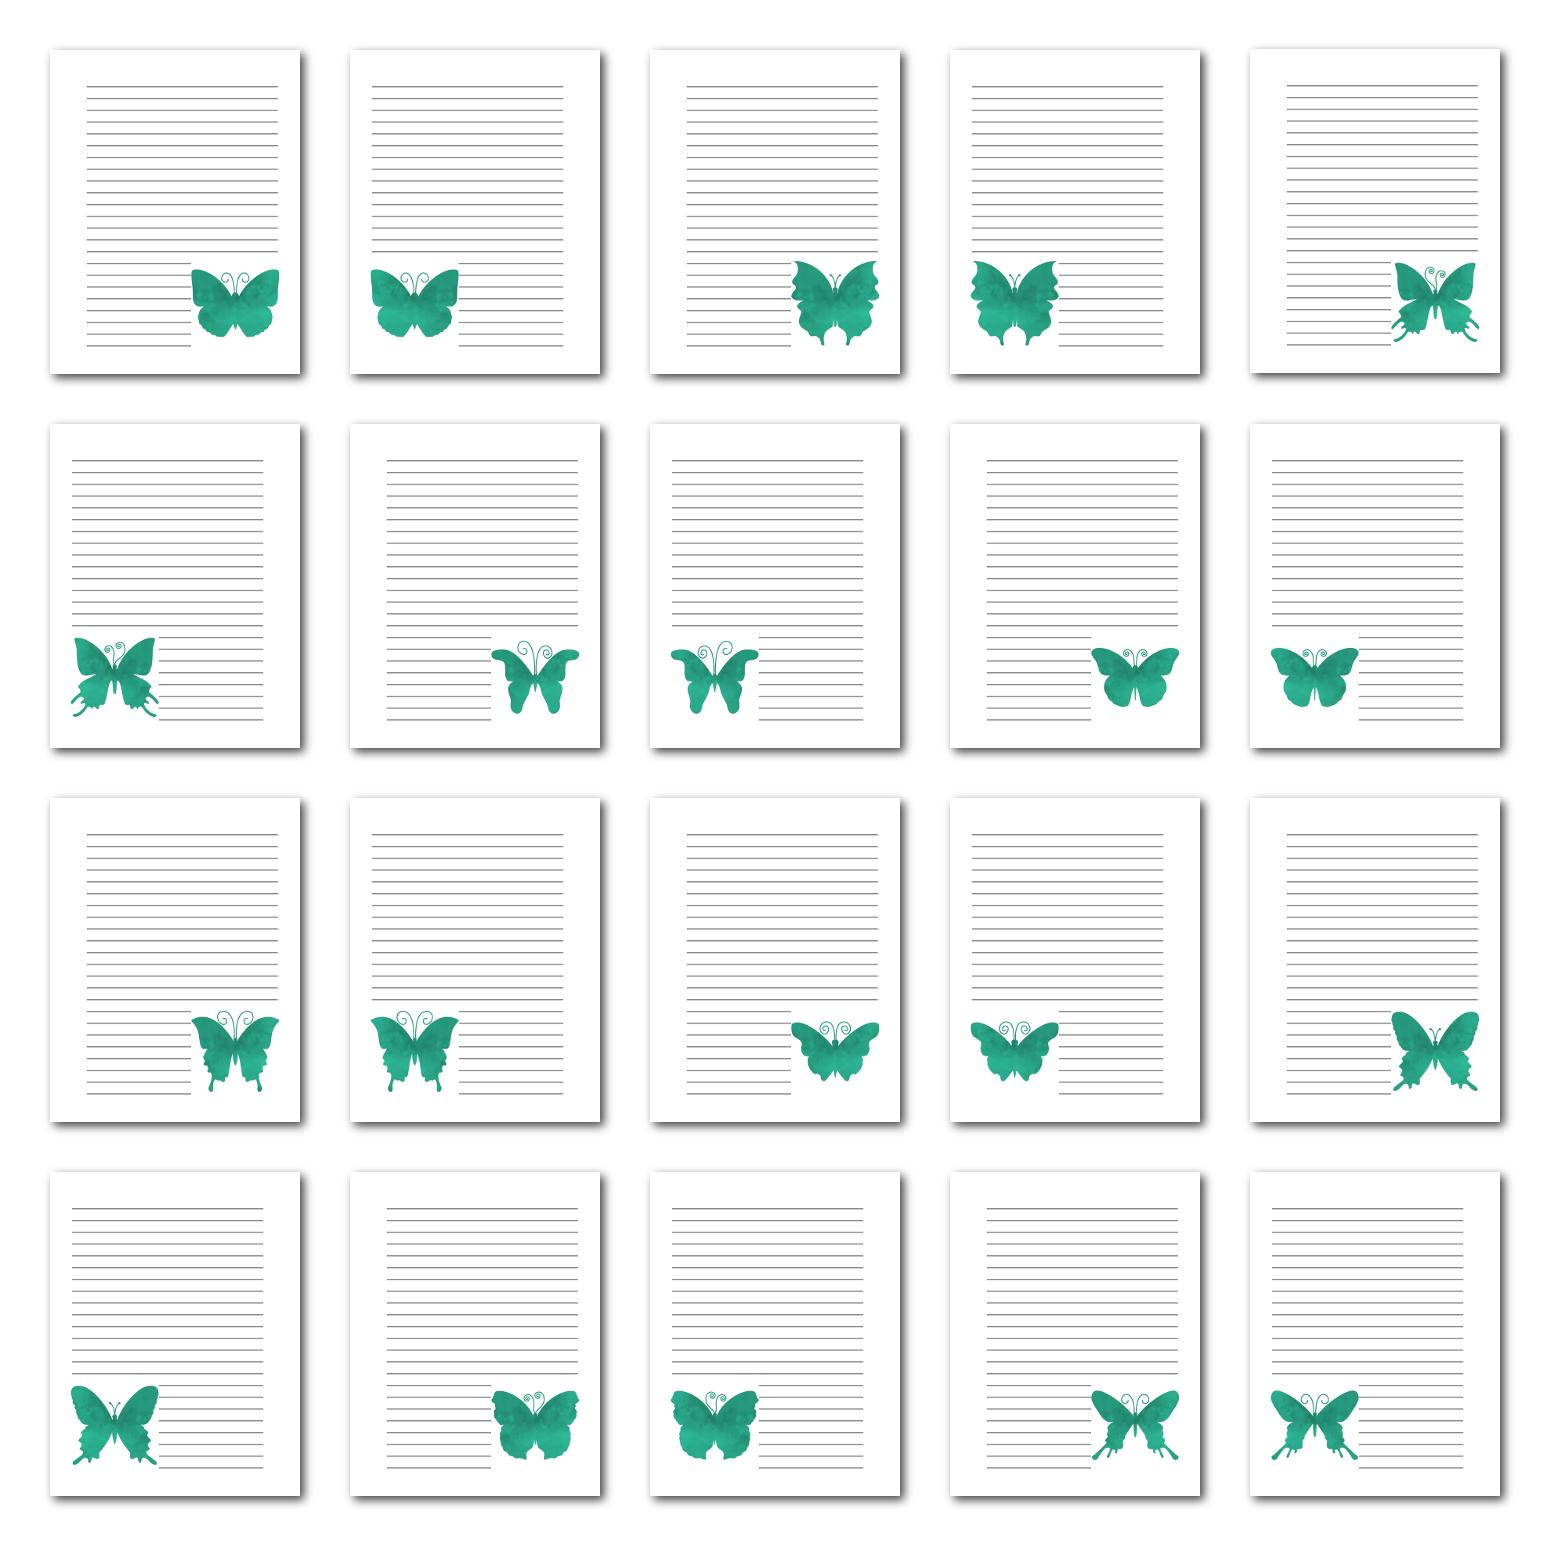 Zen PLR Journal Templates Light Watercolor Butterflies Turquoise Print Journal Pages